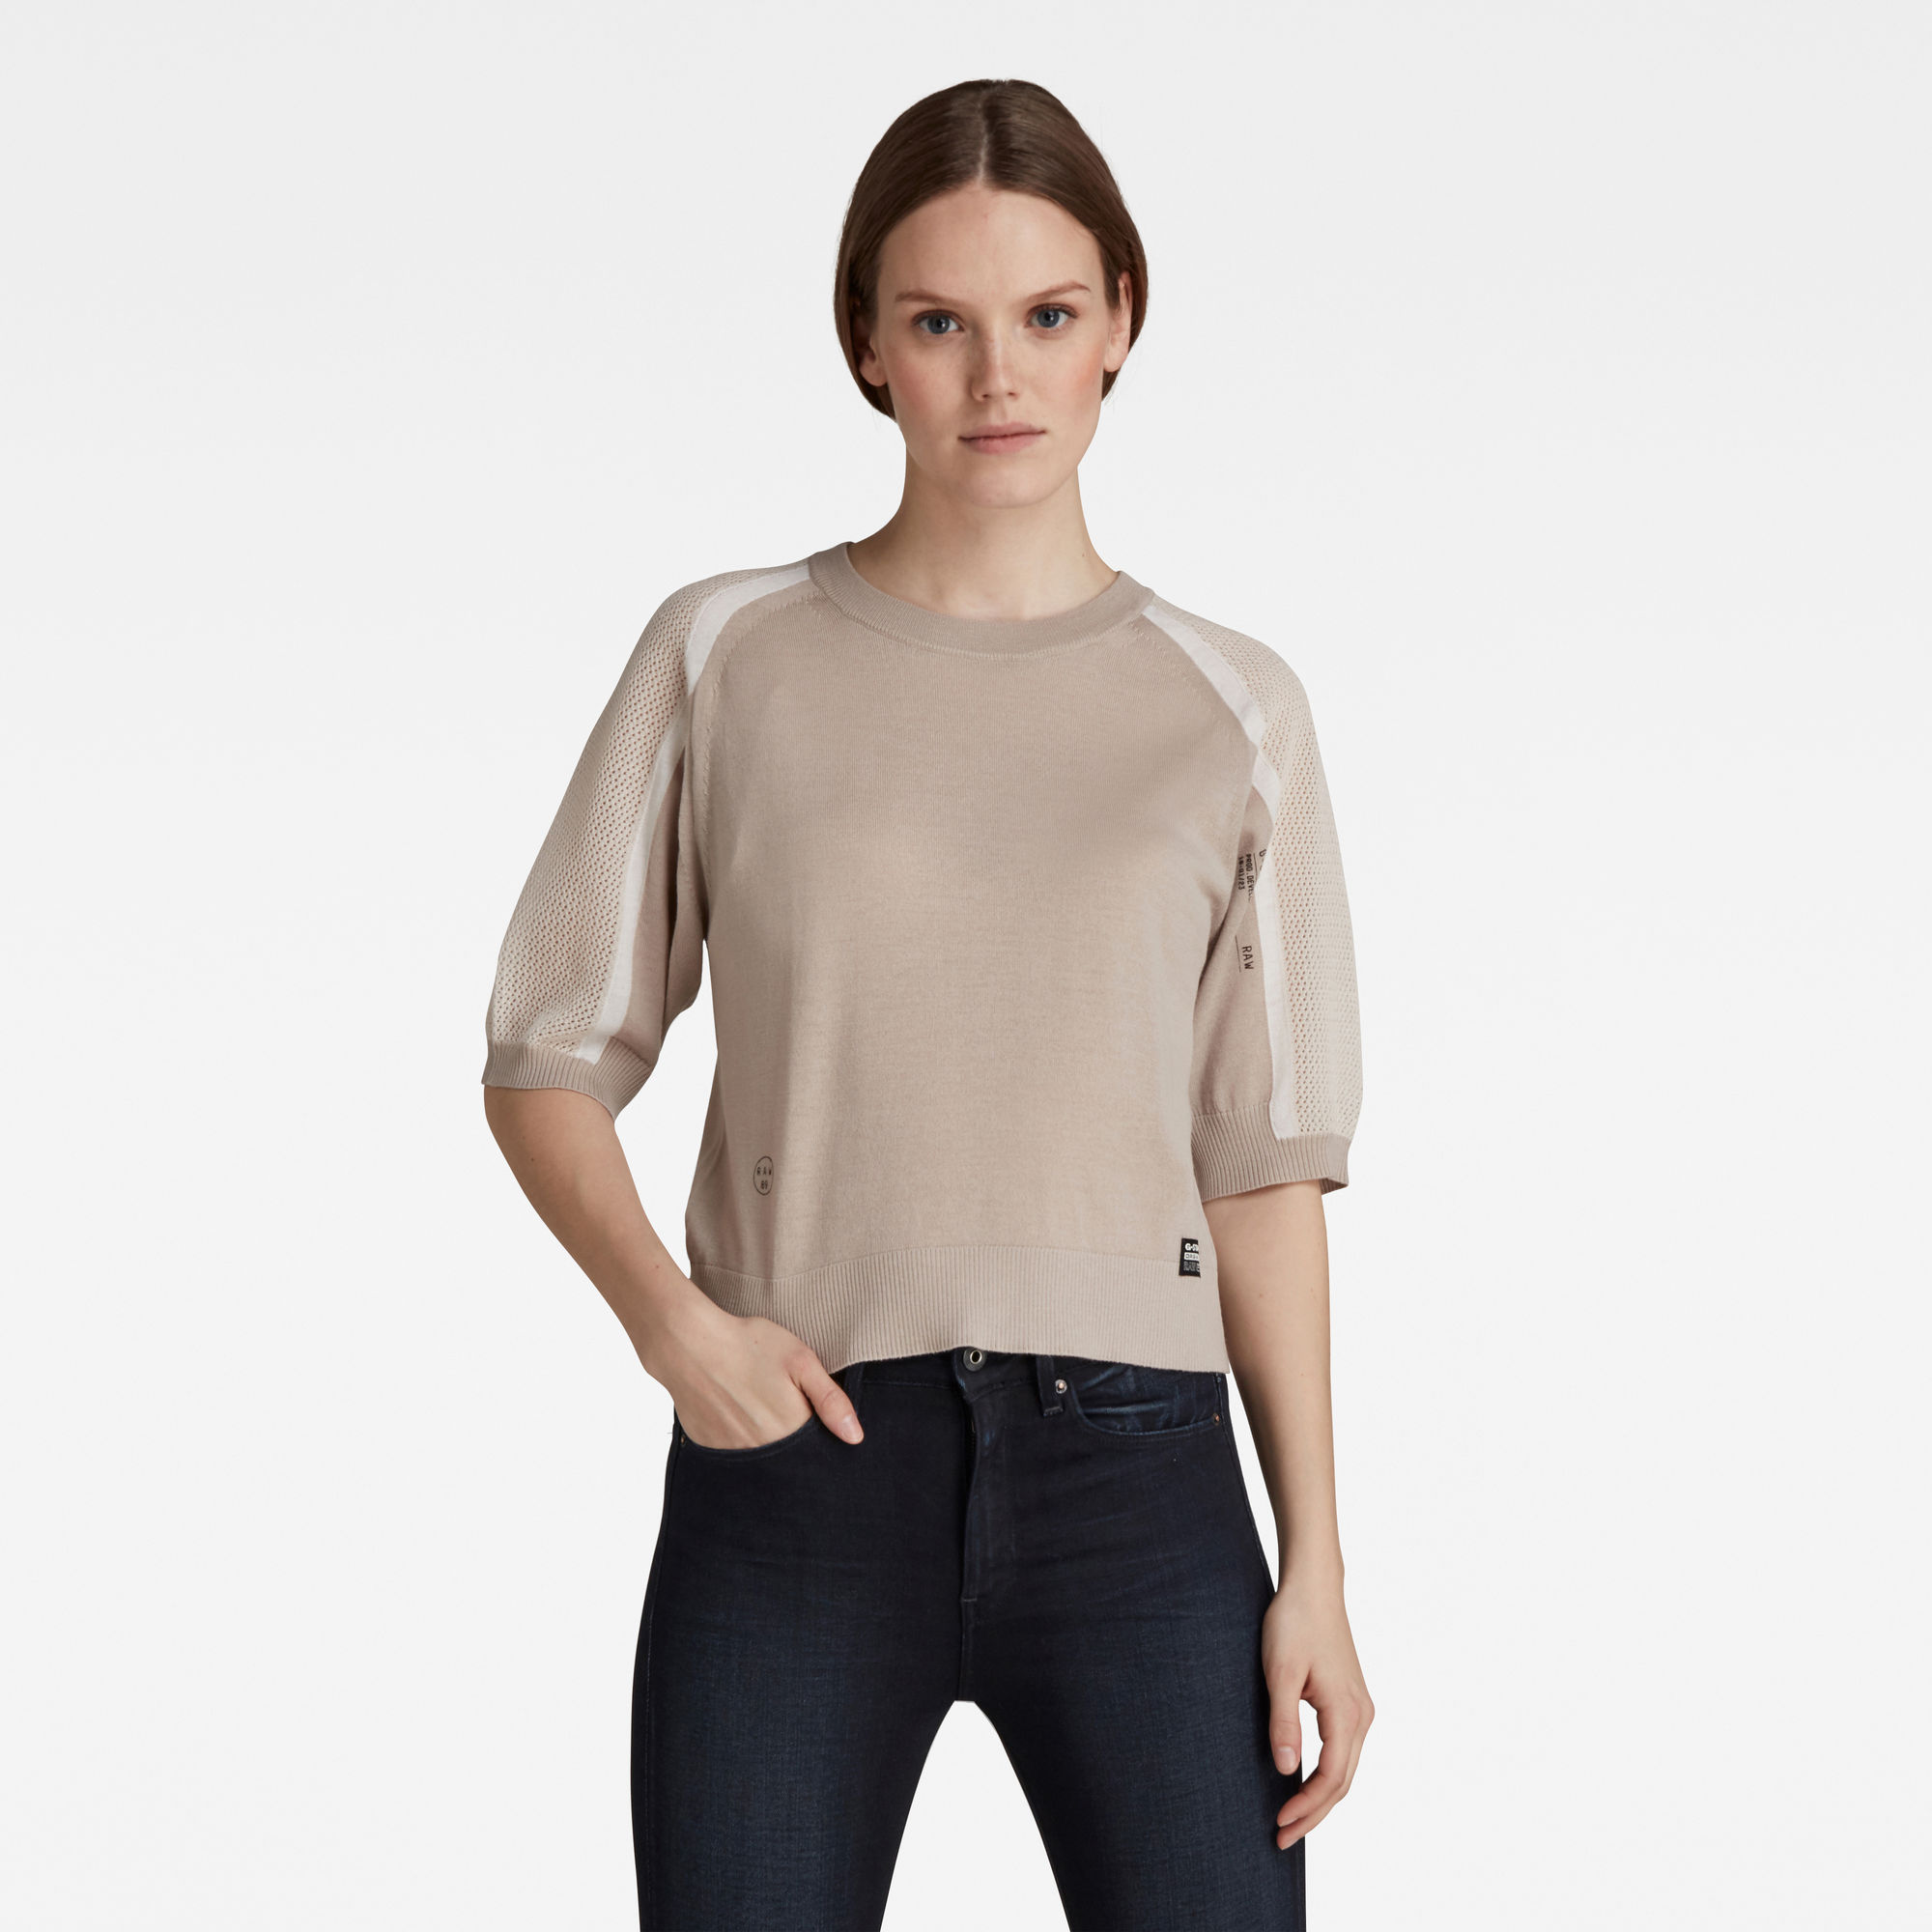 G-Star RAW Dames Mesh Insert Sweater Beige